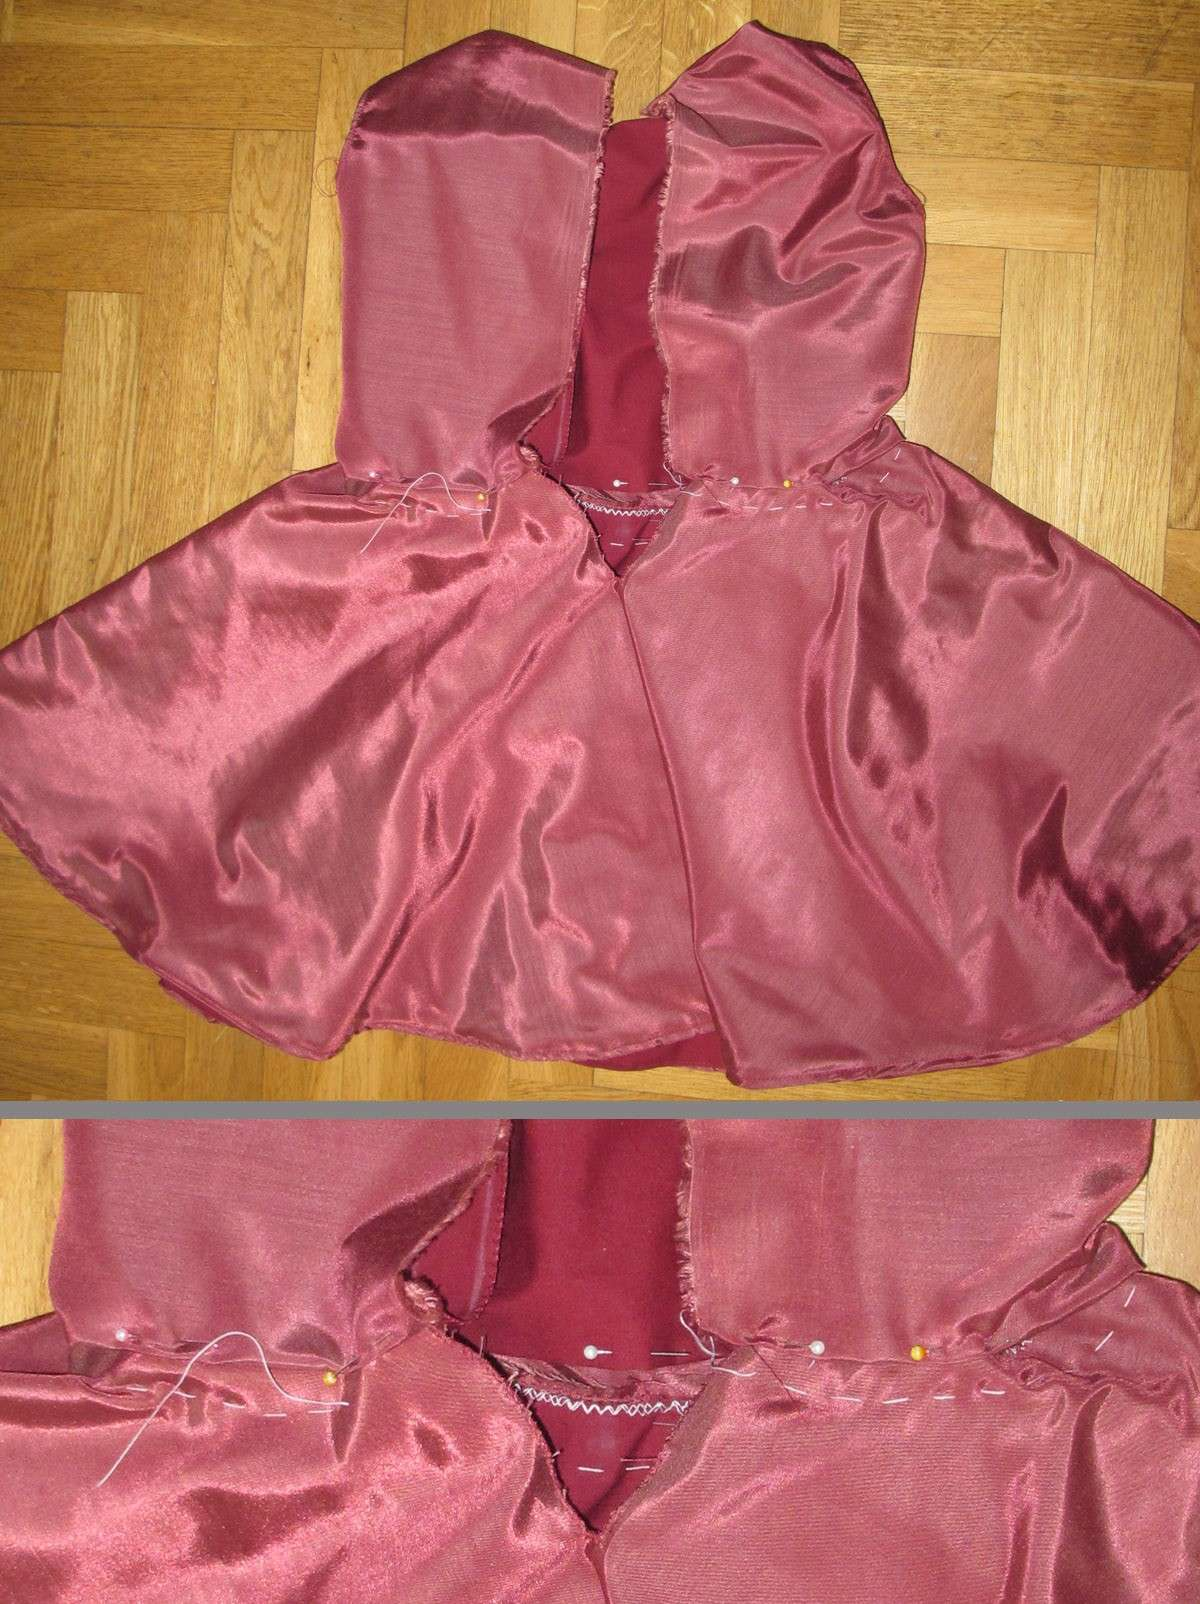 http://i41.servimg.com/u/f41/09/01/63/29/robe-t33.jpg